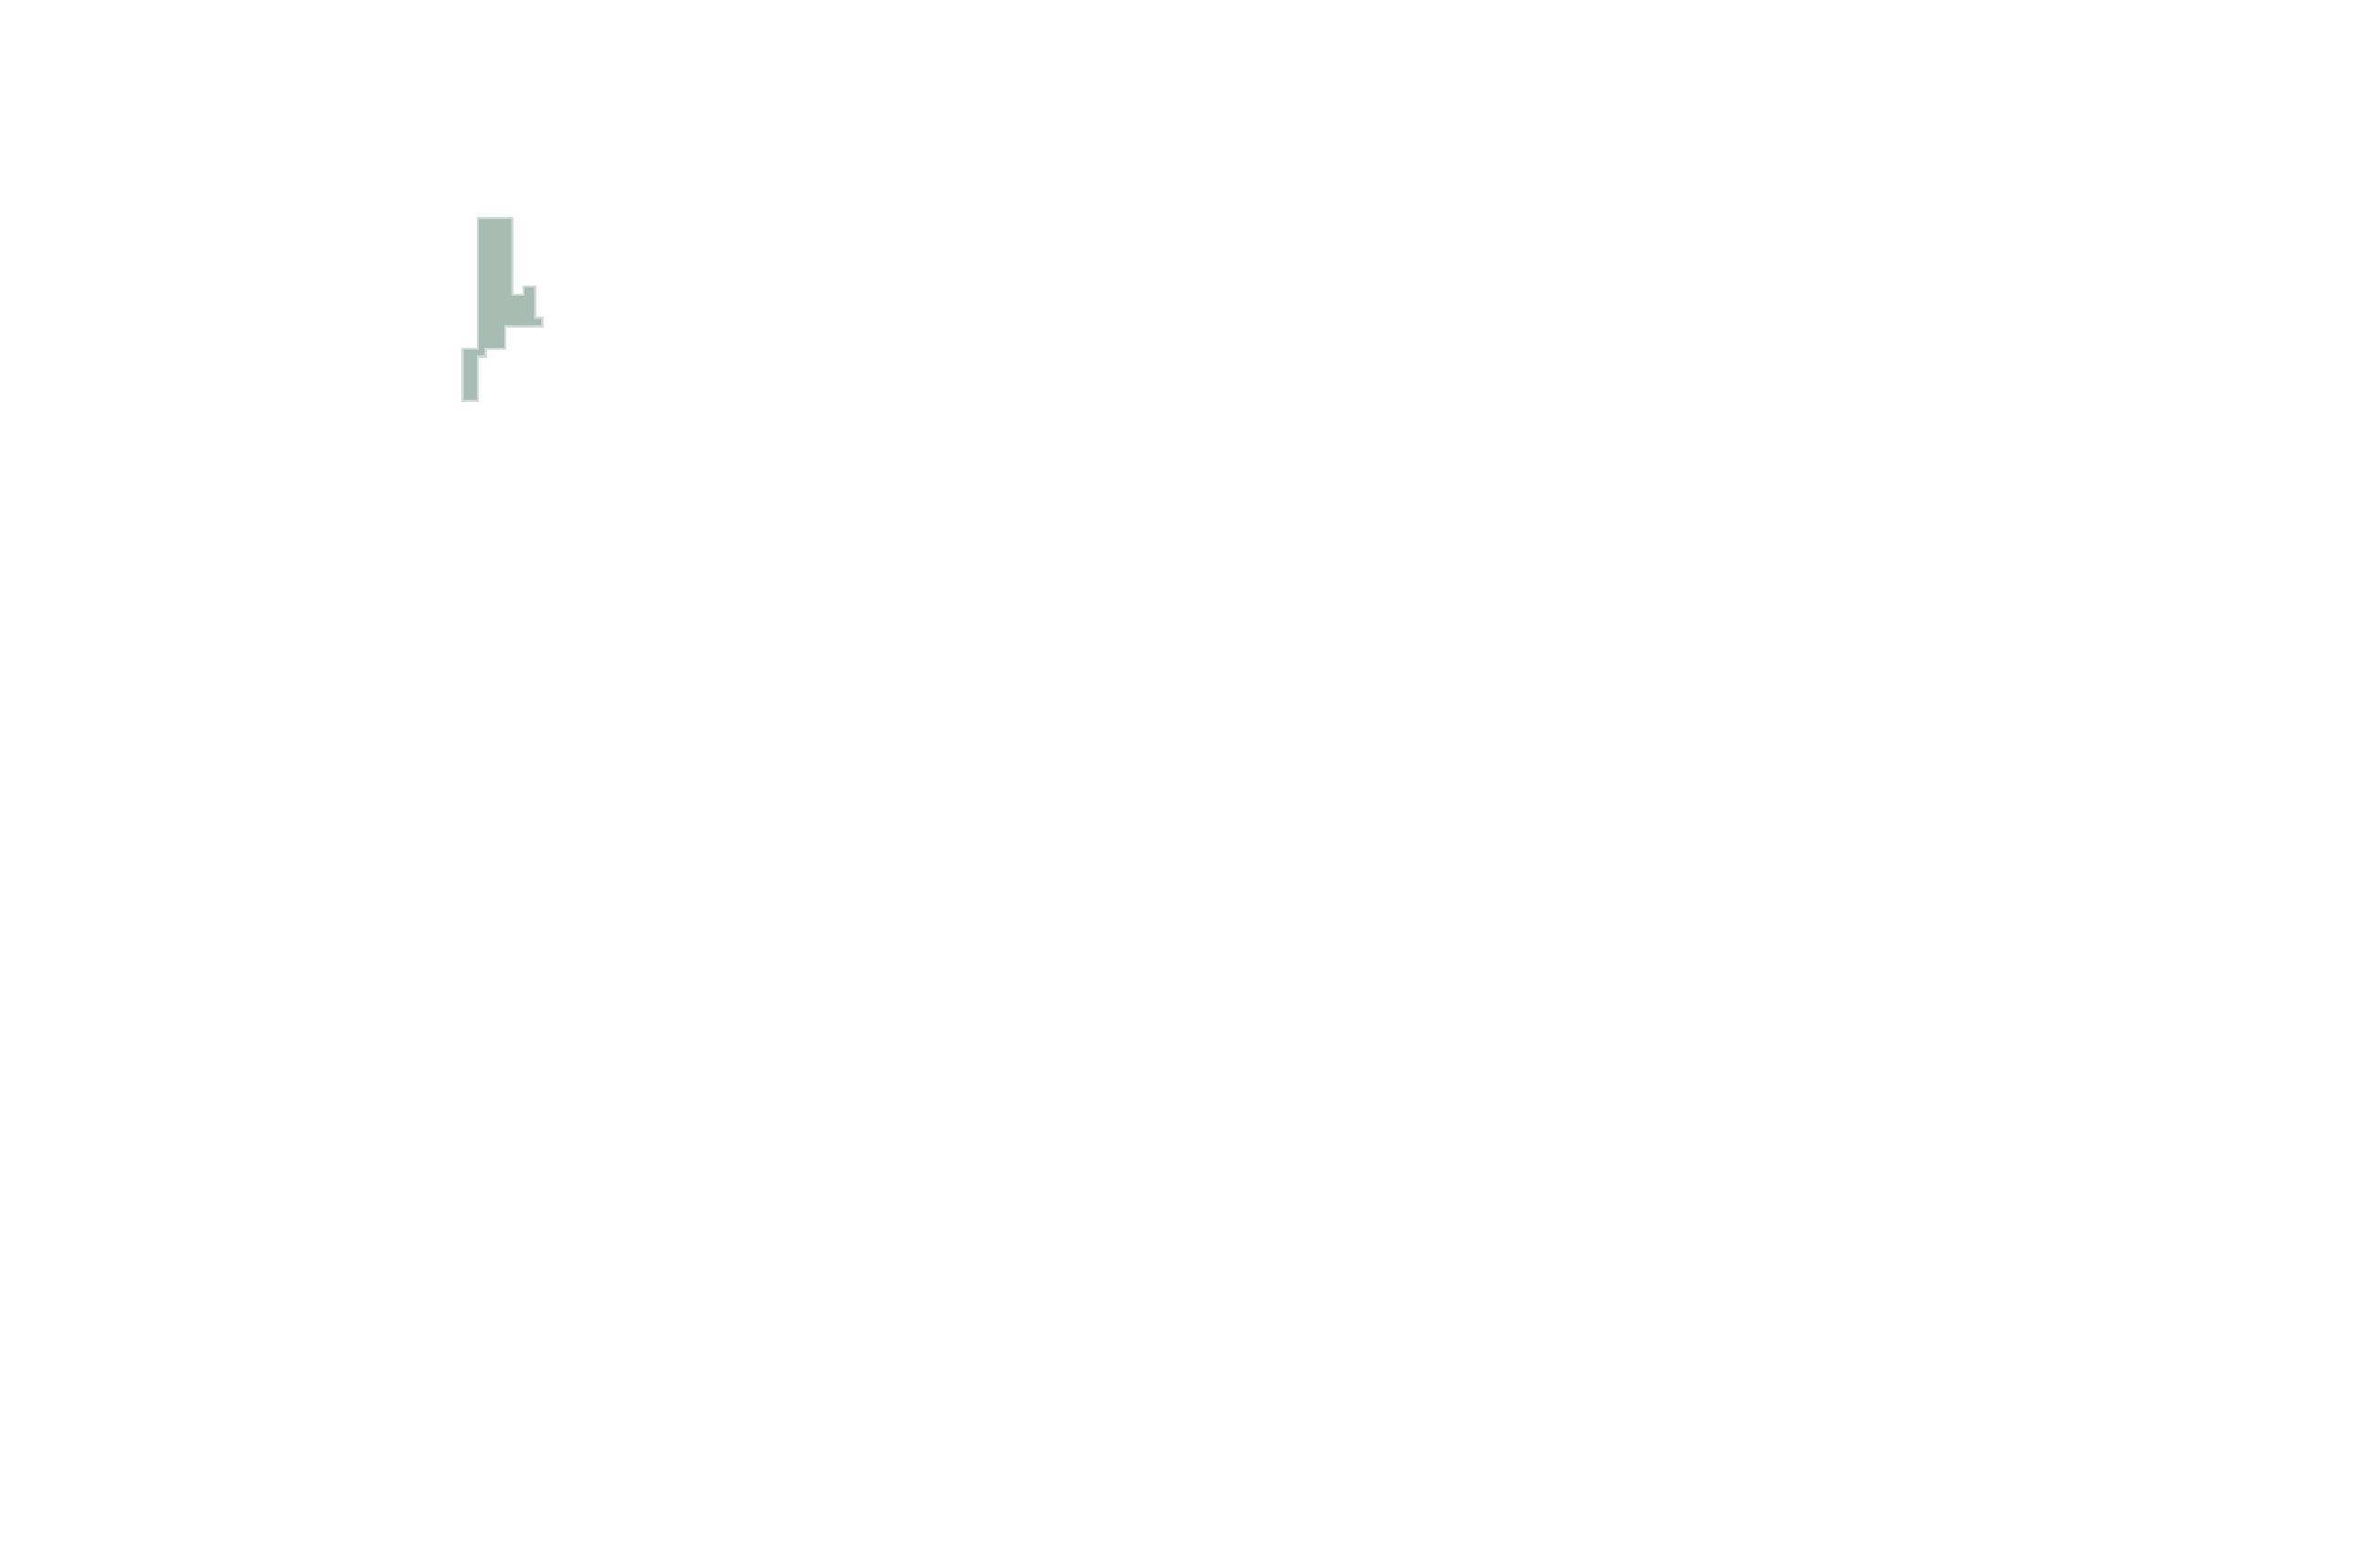 Unit e015